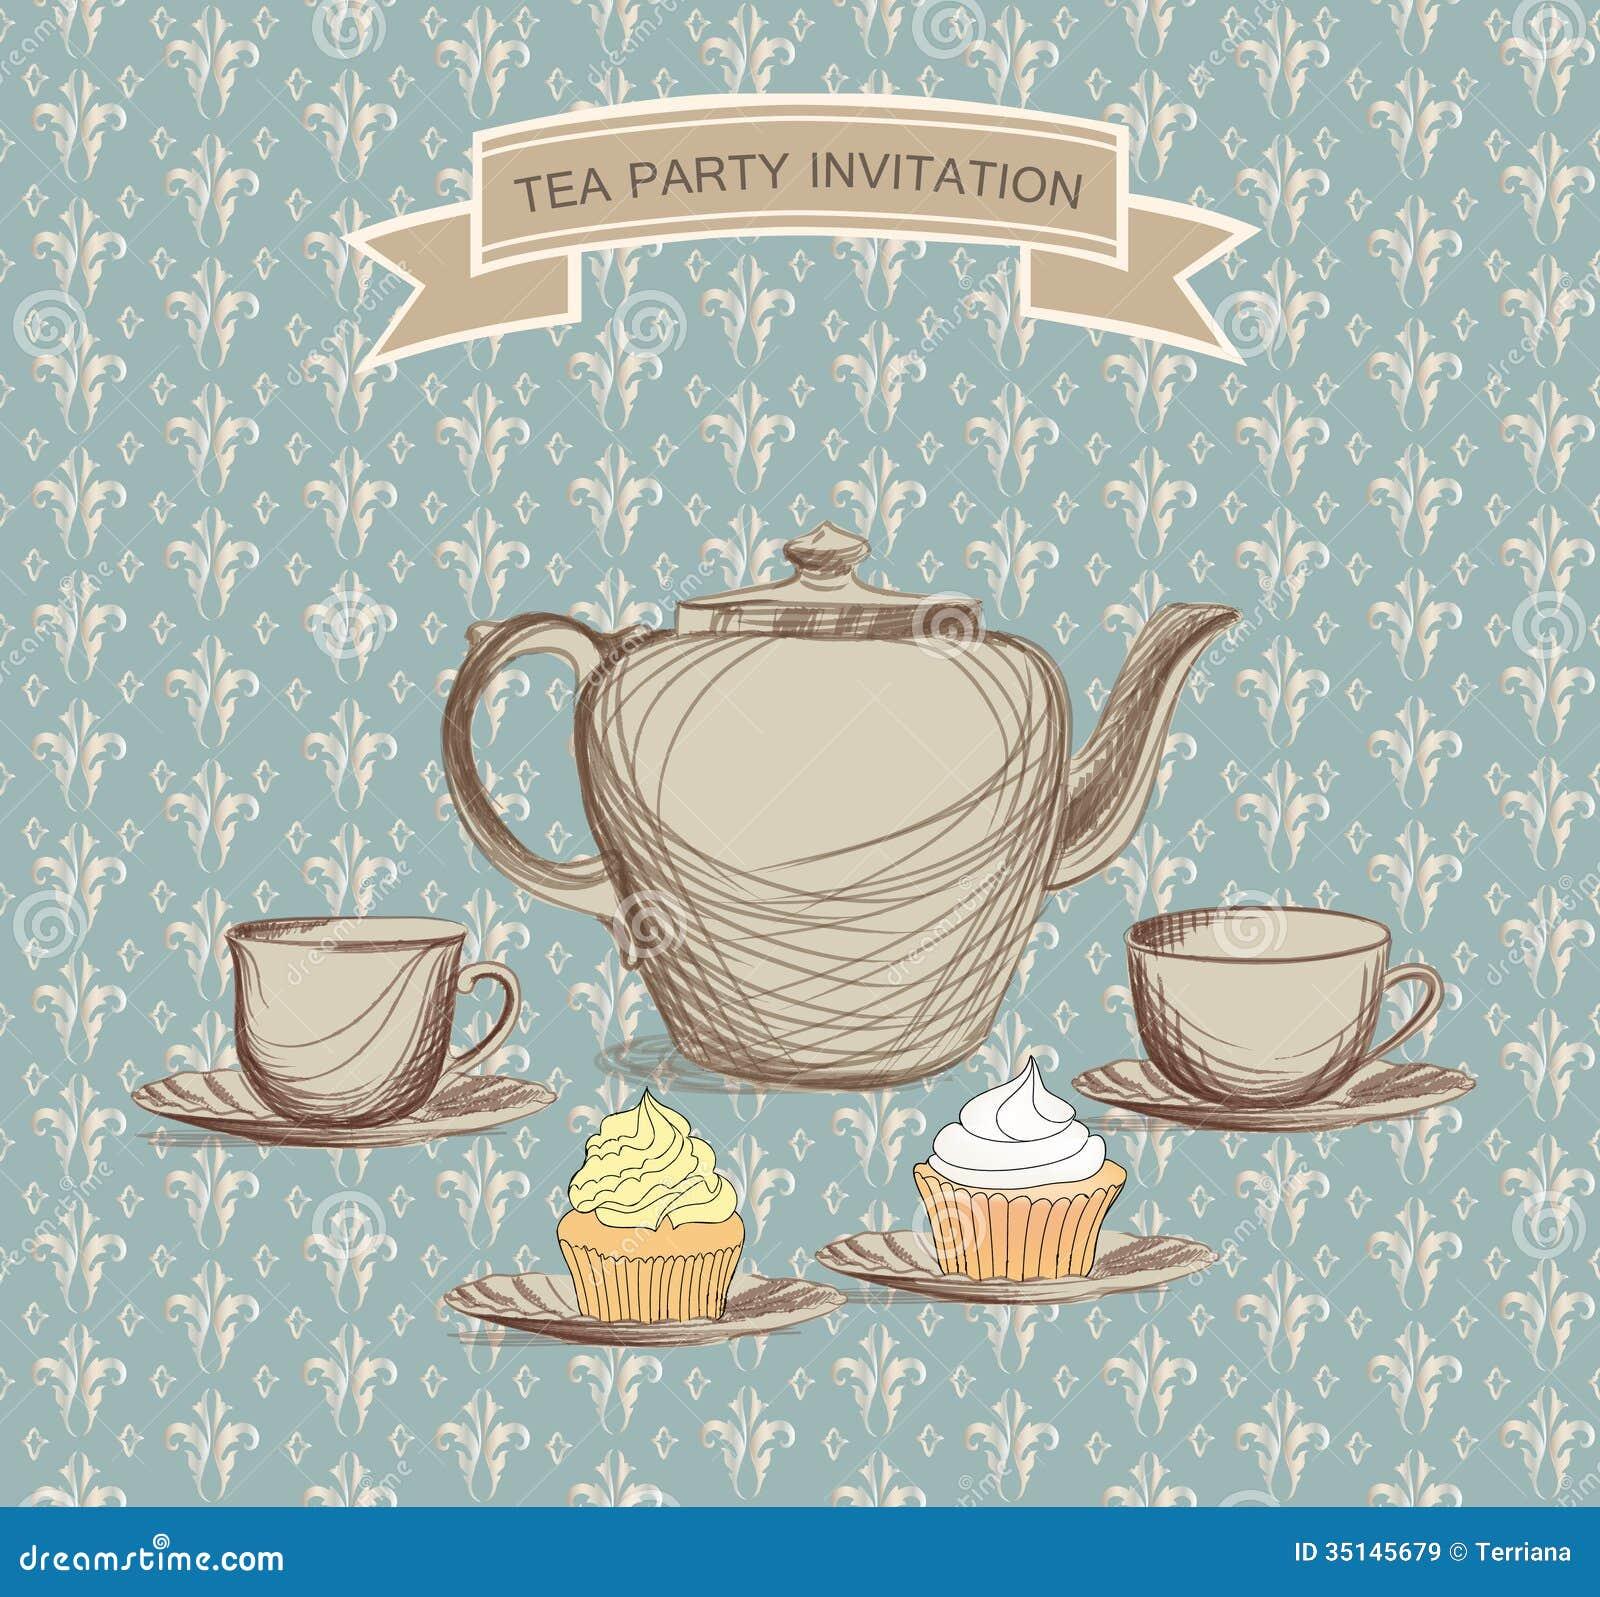 Teapot Invitation Template was good invitation example